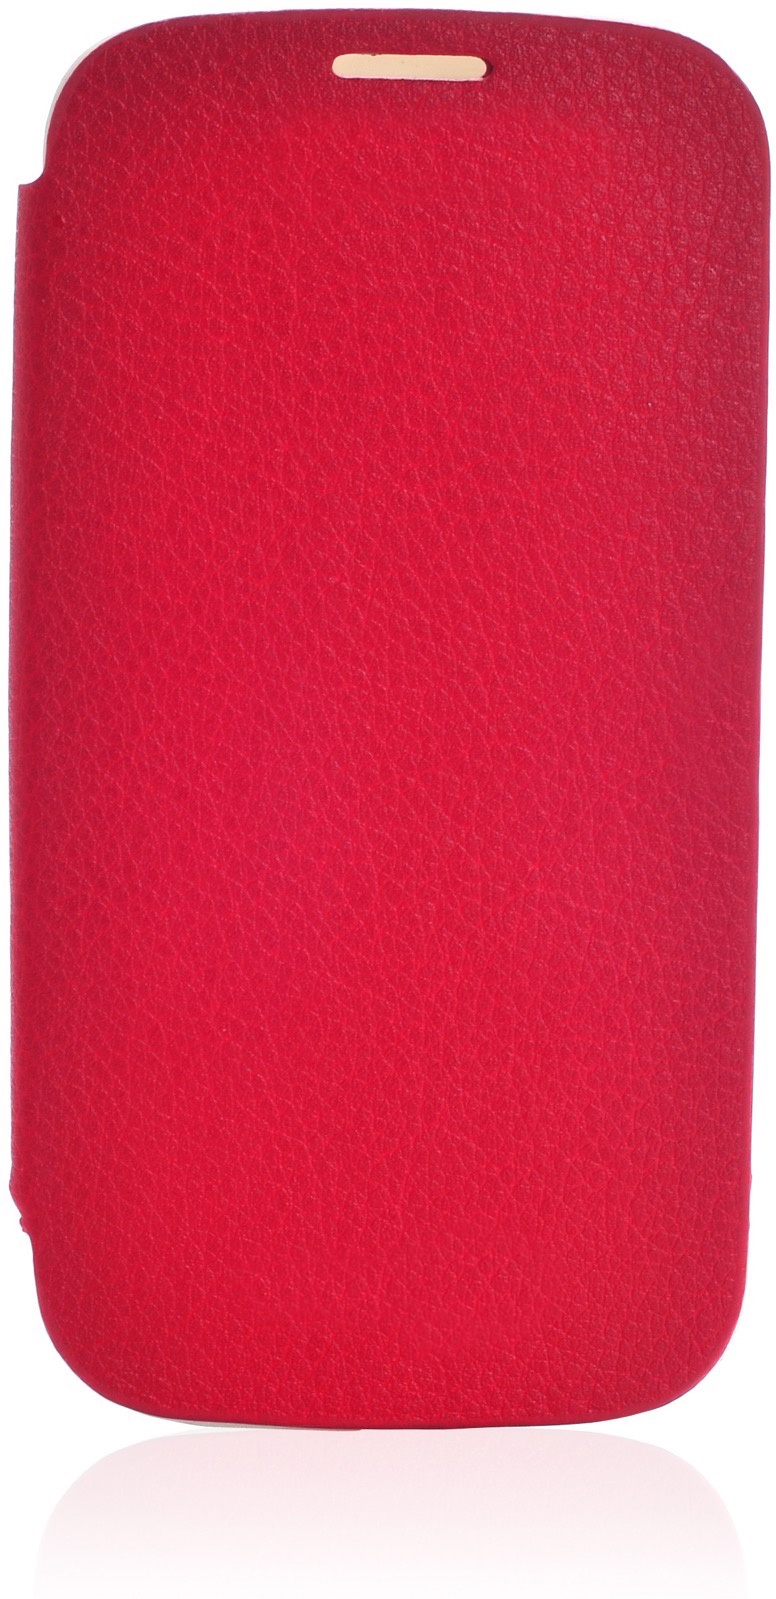 Чехол Gurdini Flip Cover Shell кожа 380063 для Samsung Galaxy S3,380063, красный